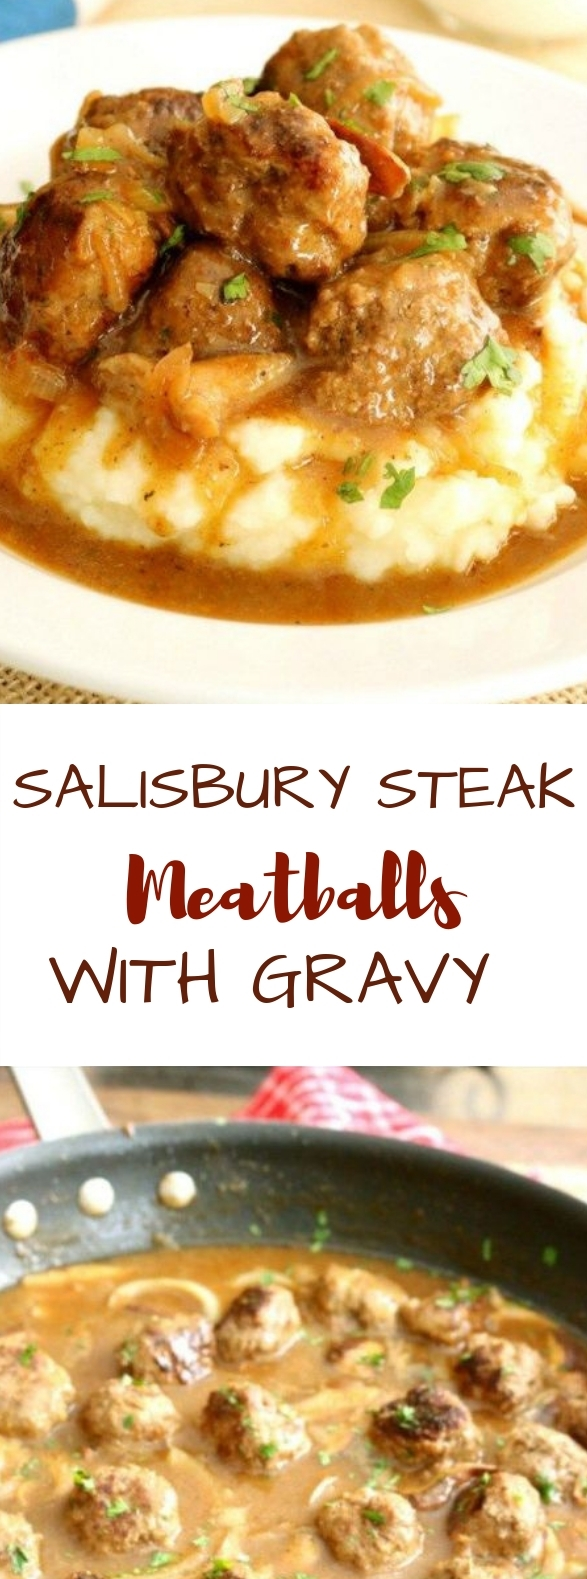 Salisbury Steak Meatballs with Mushroom Gravy #steak #dinner